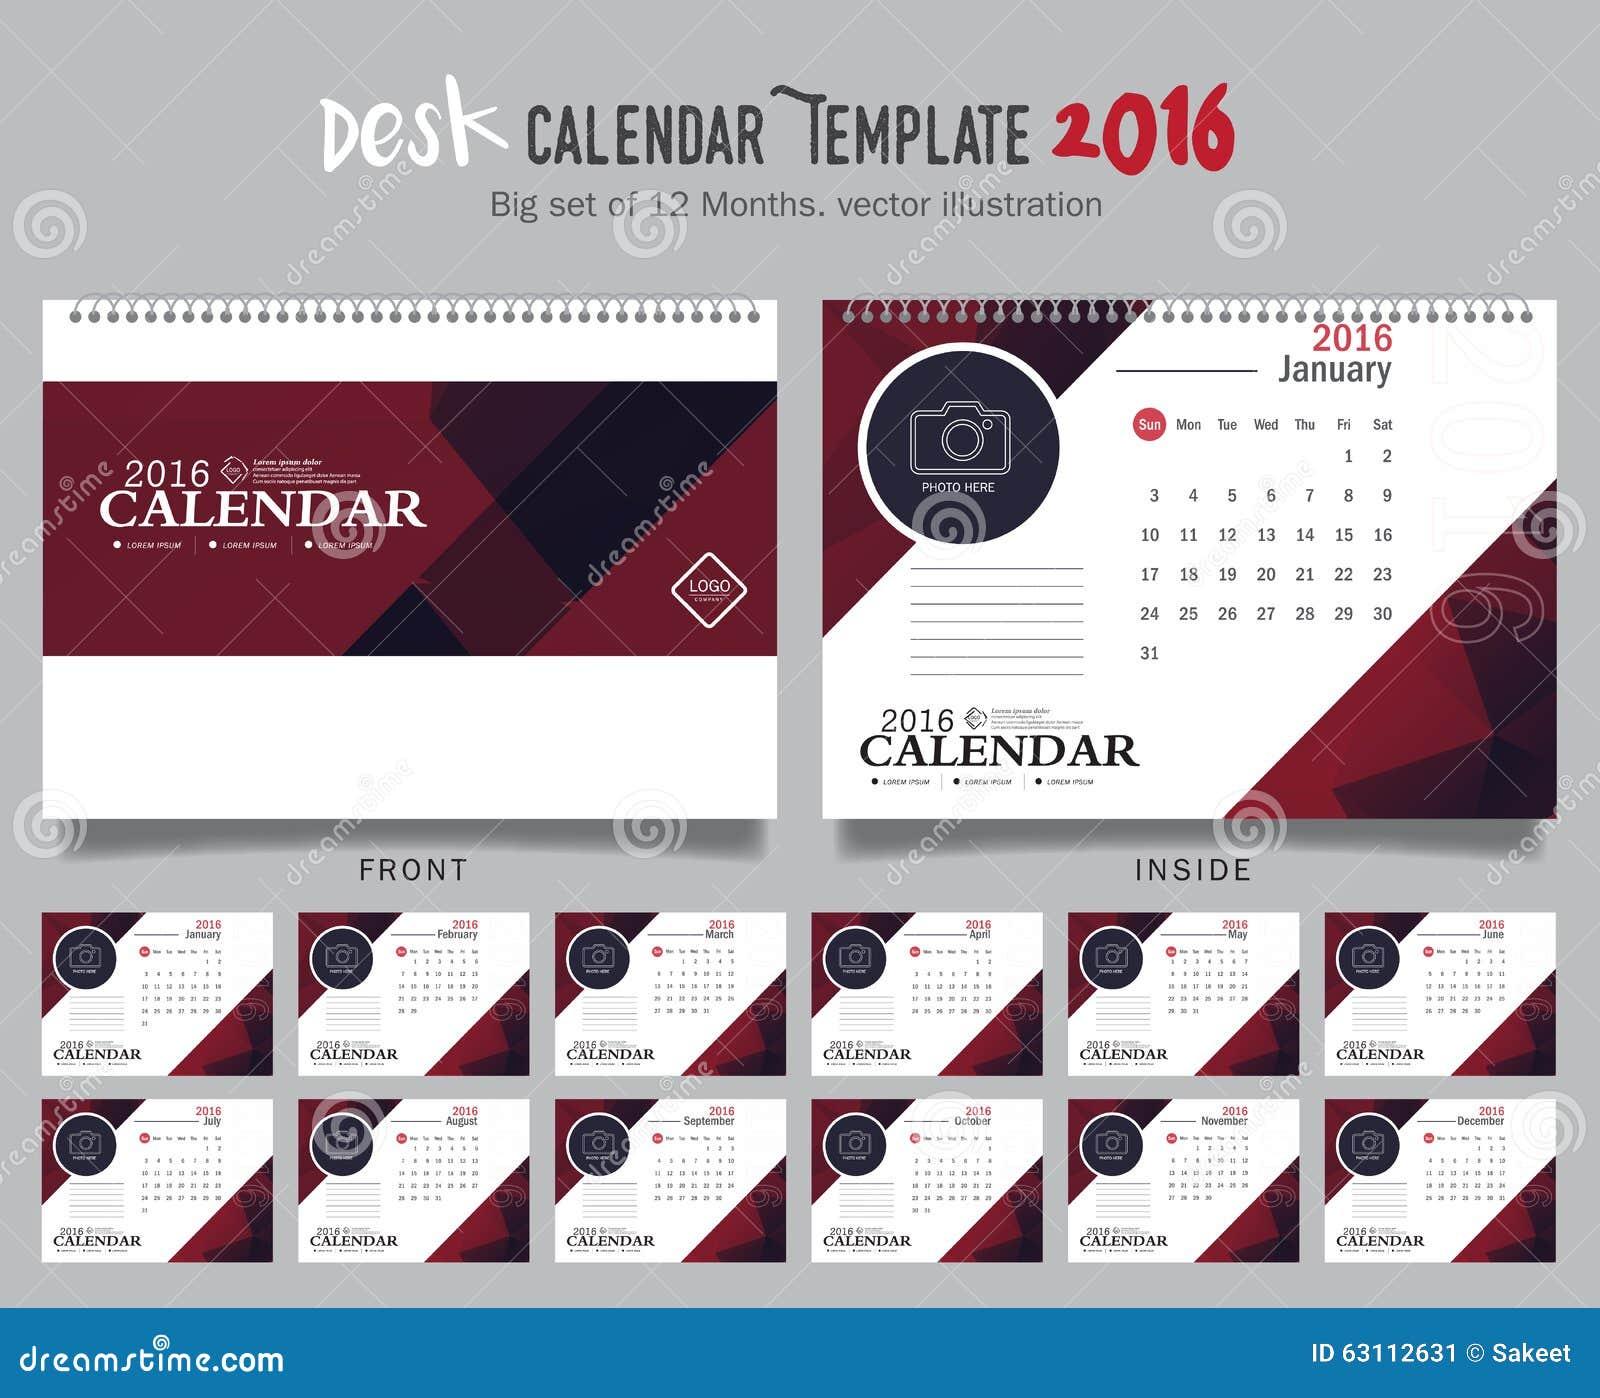 Desk Calendar Design Samples : Desk calendar vector design template big set of